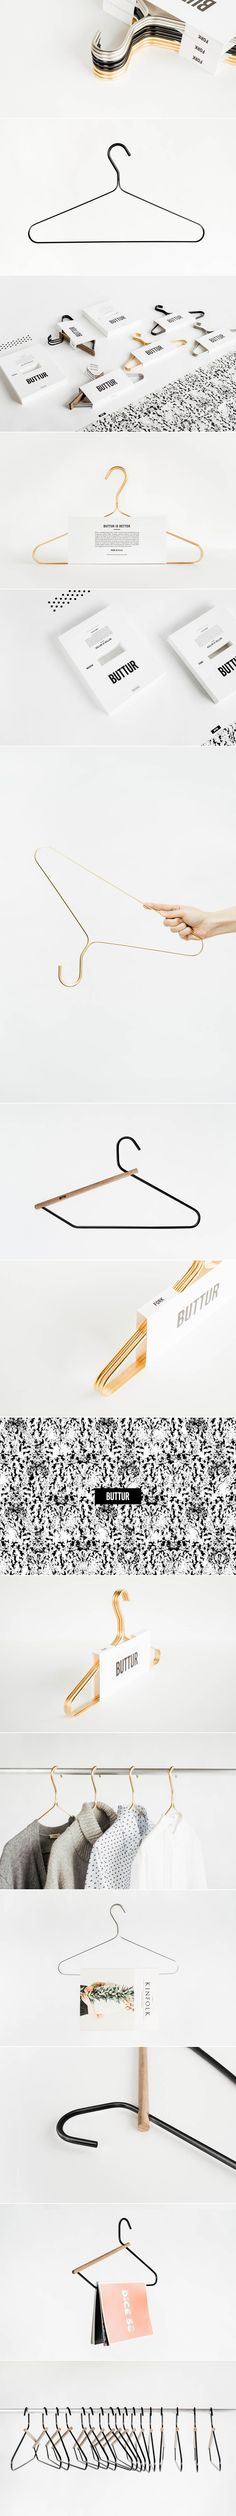 Buttur. No ordinary hangers. (More design inspiration at www.aldenchong.com)